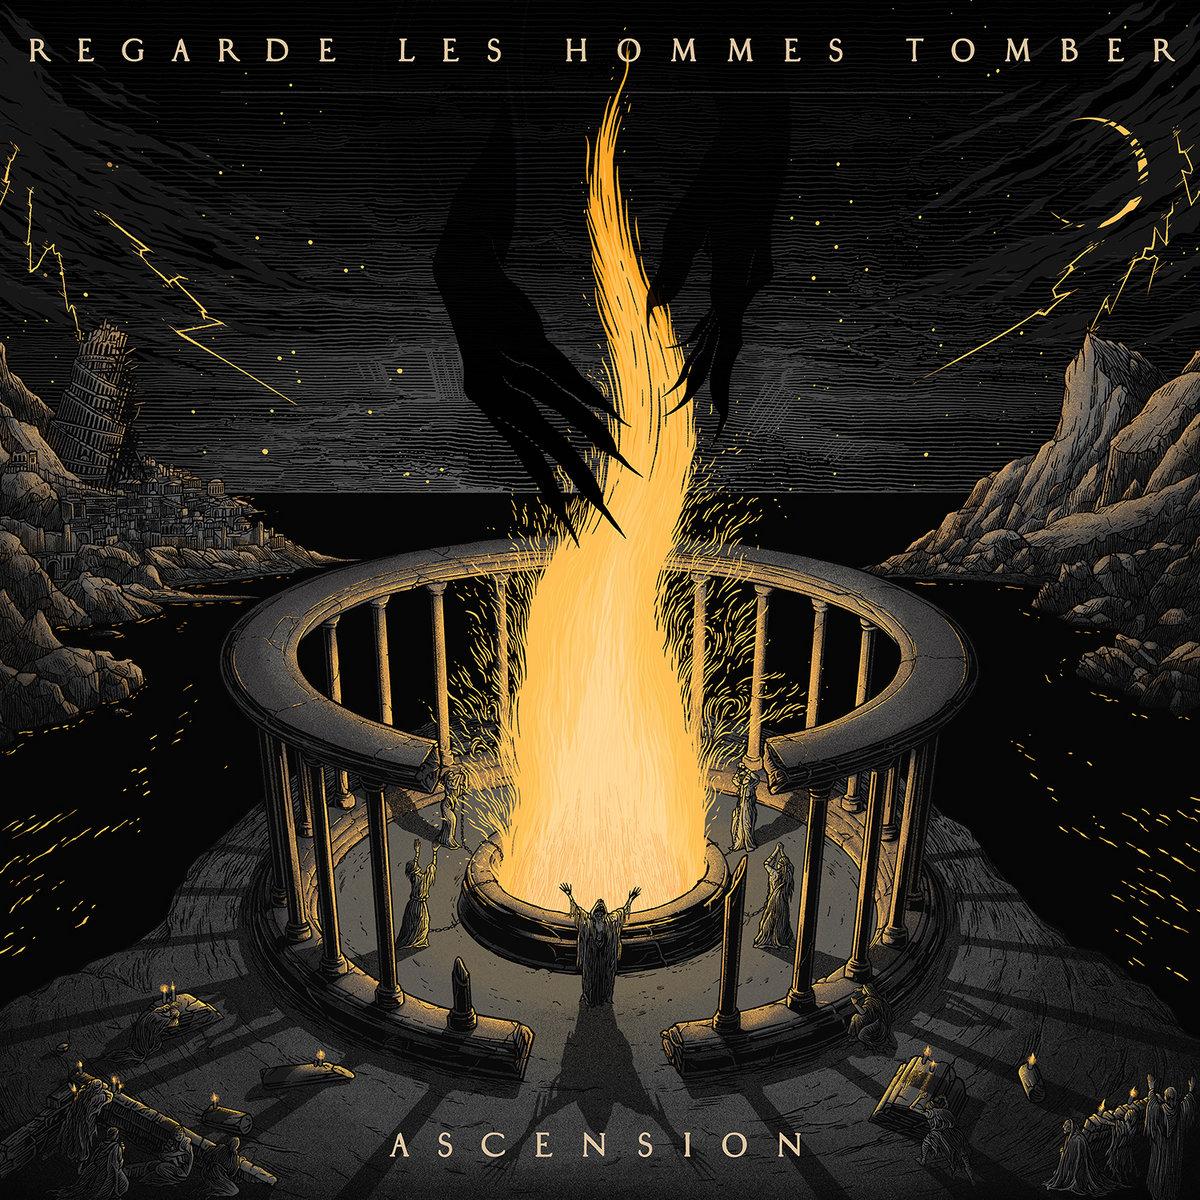 Metal View: REGARDE LES HOMMES TOMBER-ASCENSION (Album Review)